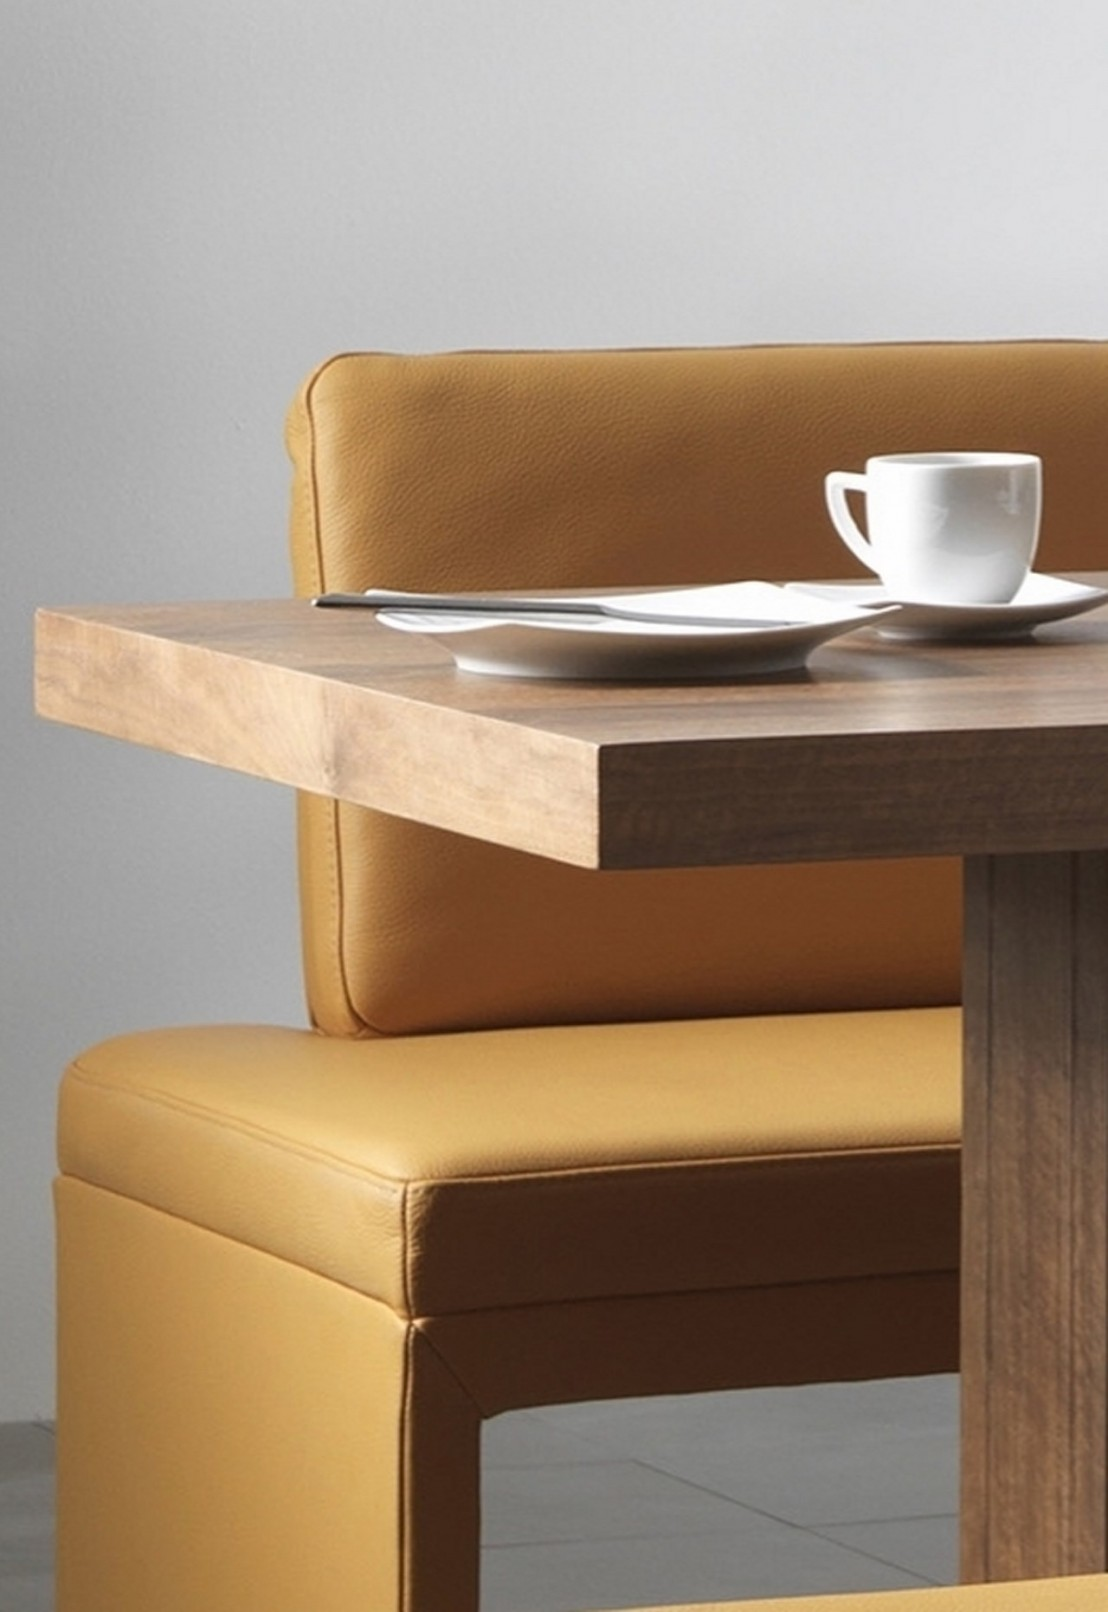 banquette d 39 angle design minimaliste dexter 227 x 266 cm. Black Bedroom Furniture Sets. Home Design Ideas